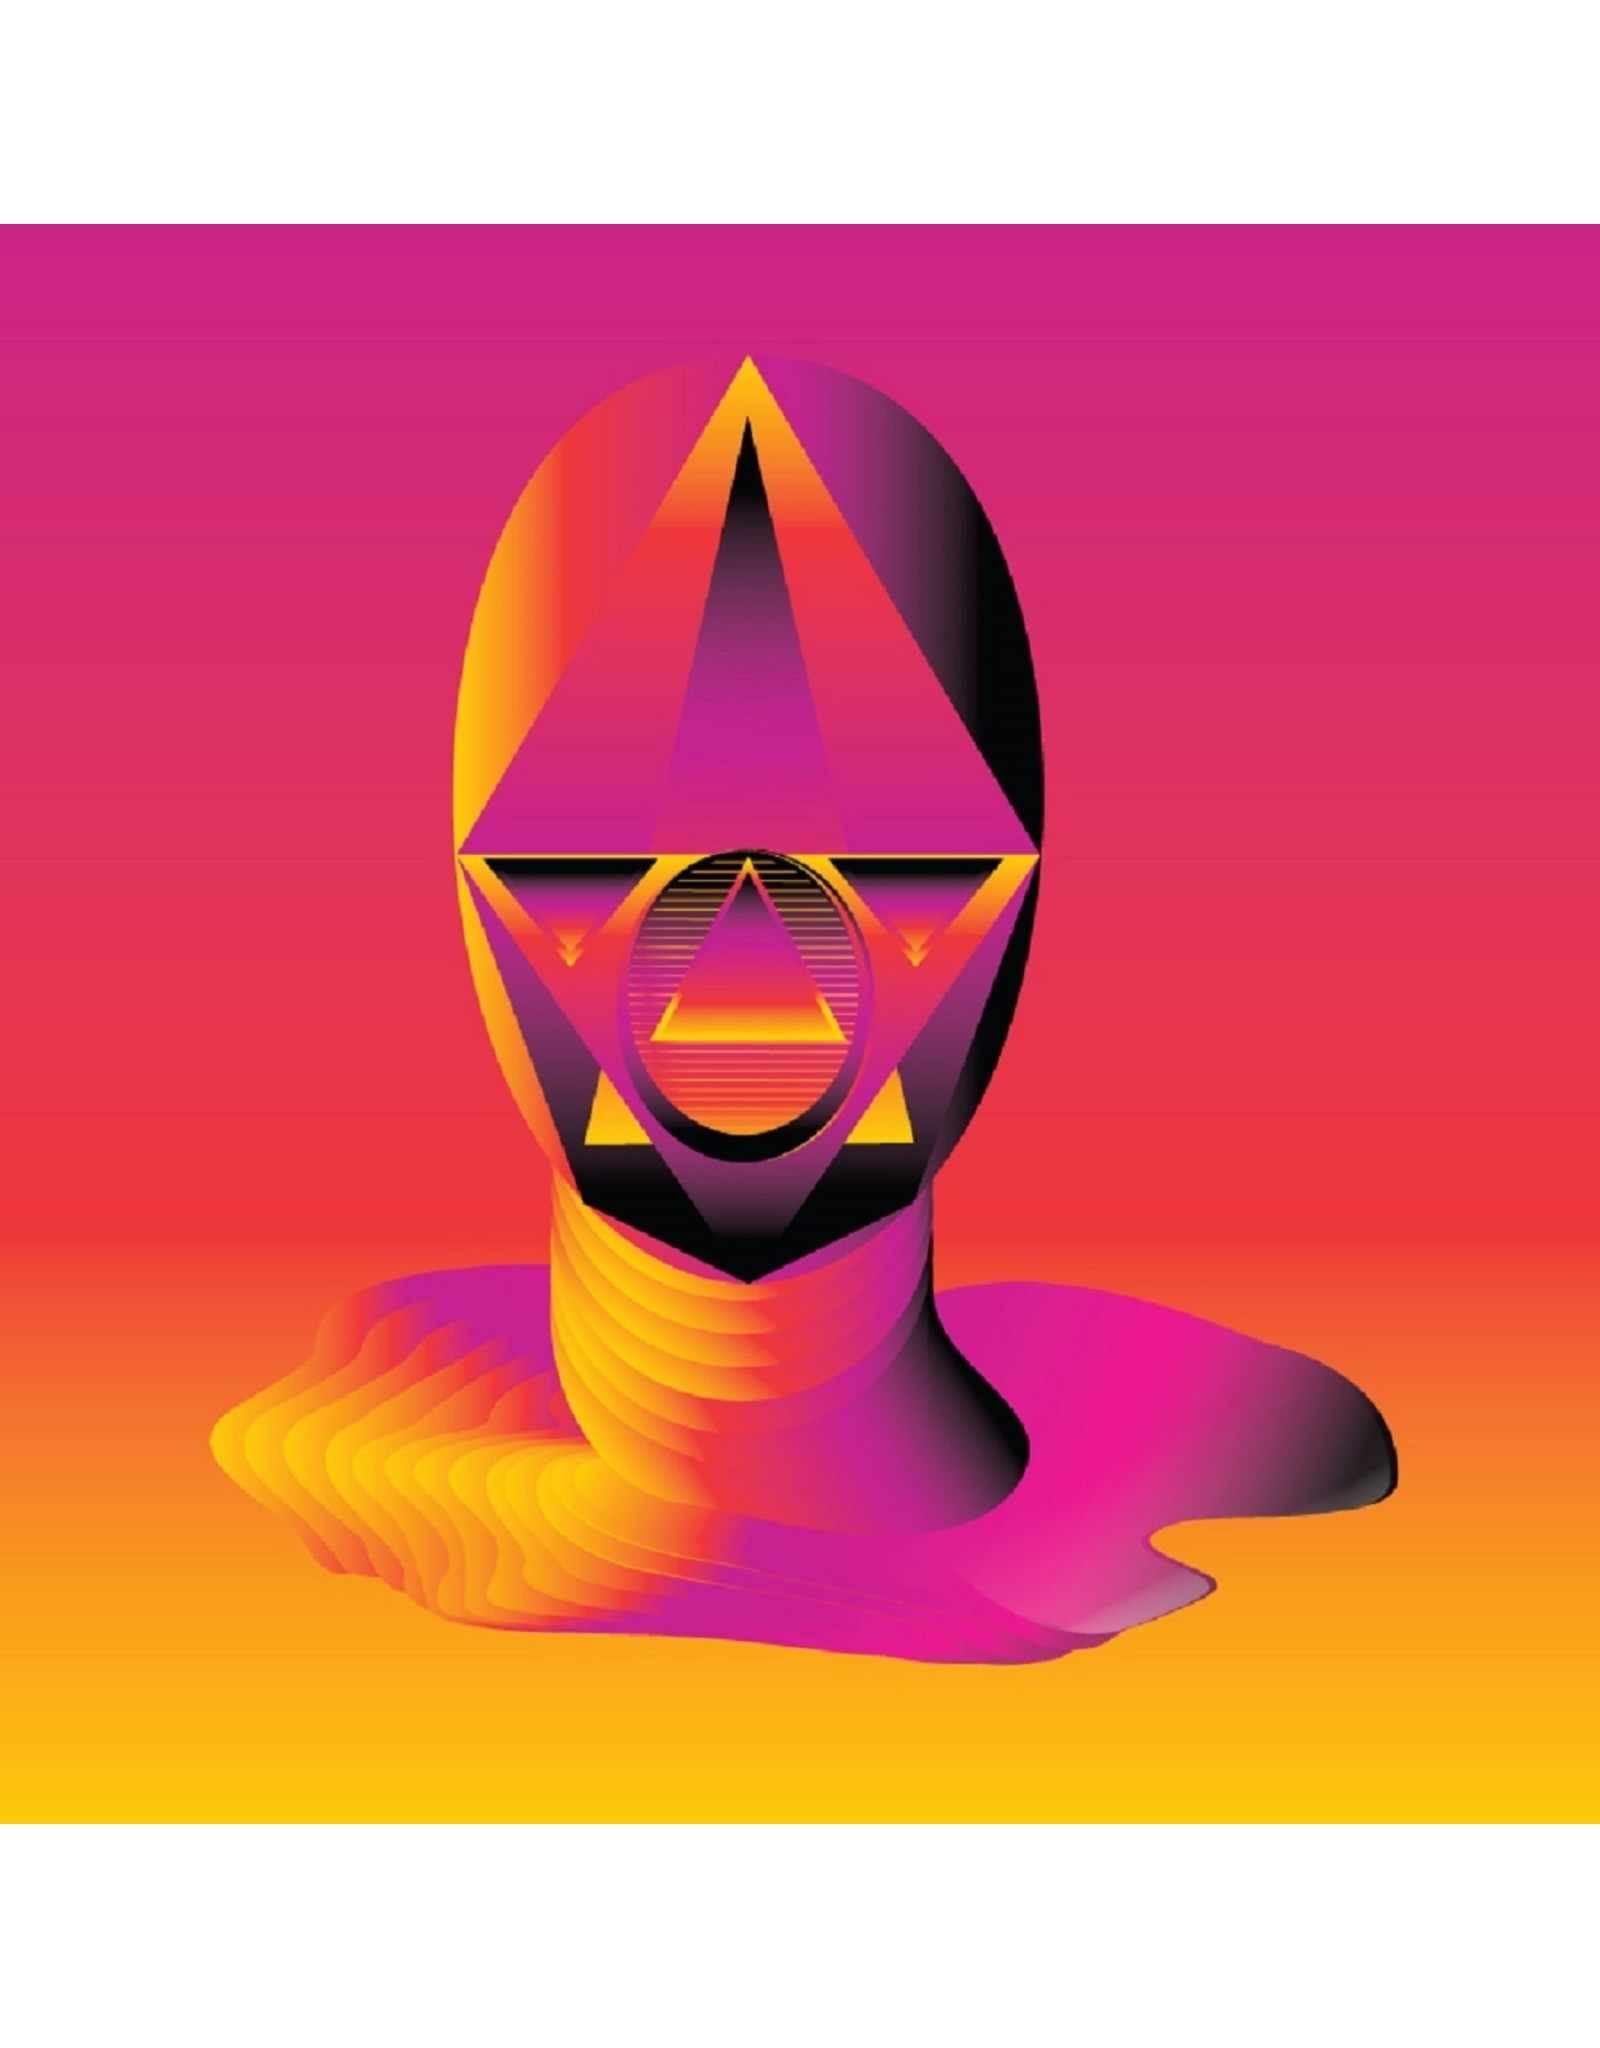 Osees - Metamorphosed LP